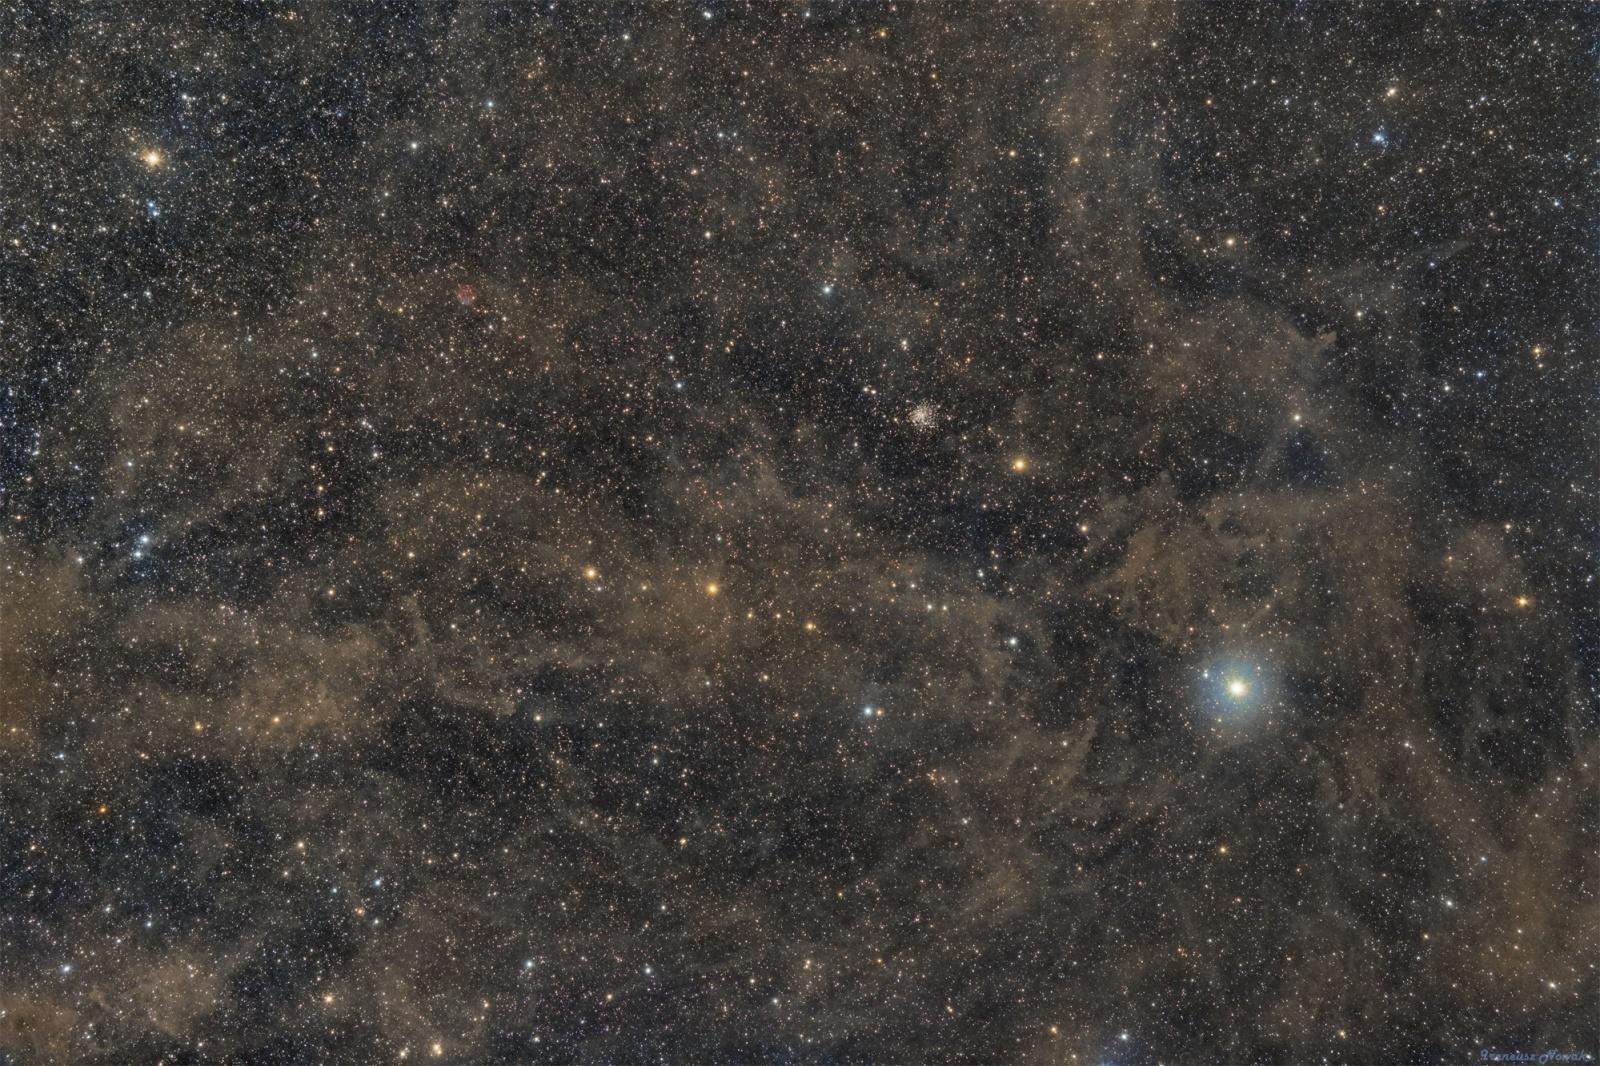 polaris-flare-ifn.thumb.jpg.5dbad738550eb791f7f33f1ae2565c21.jpg